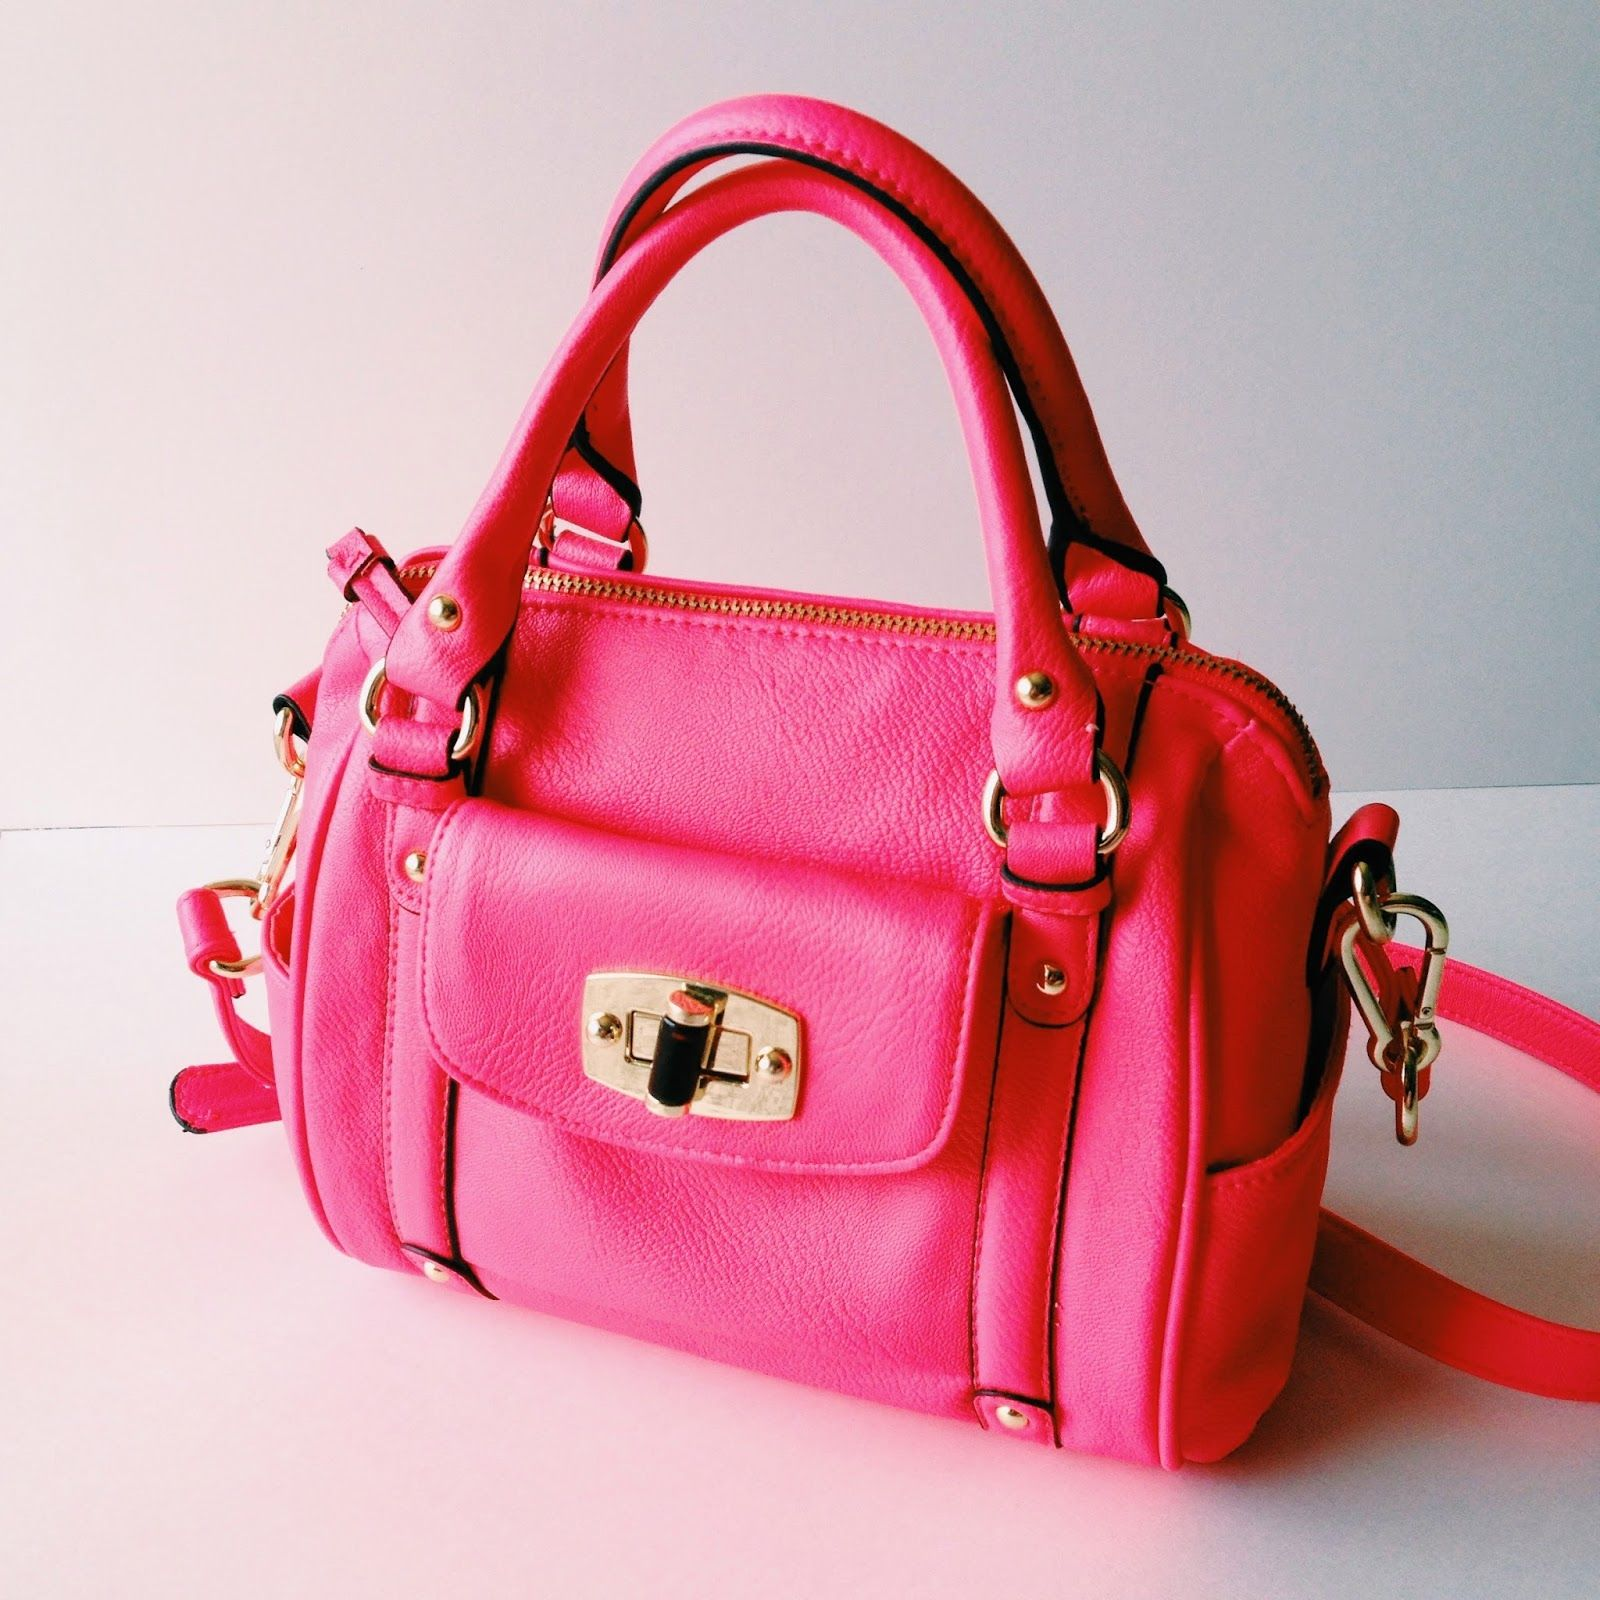 cb50a97404 Target Merona Mini Satchel  target  handbag  spring  pink  fashion  purse